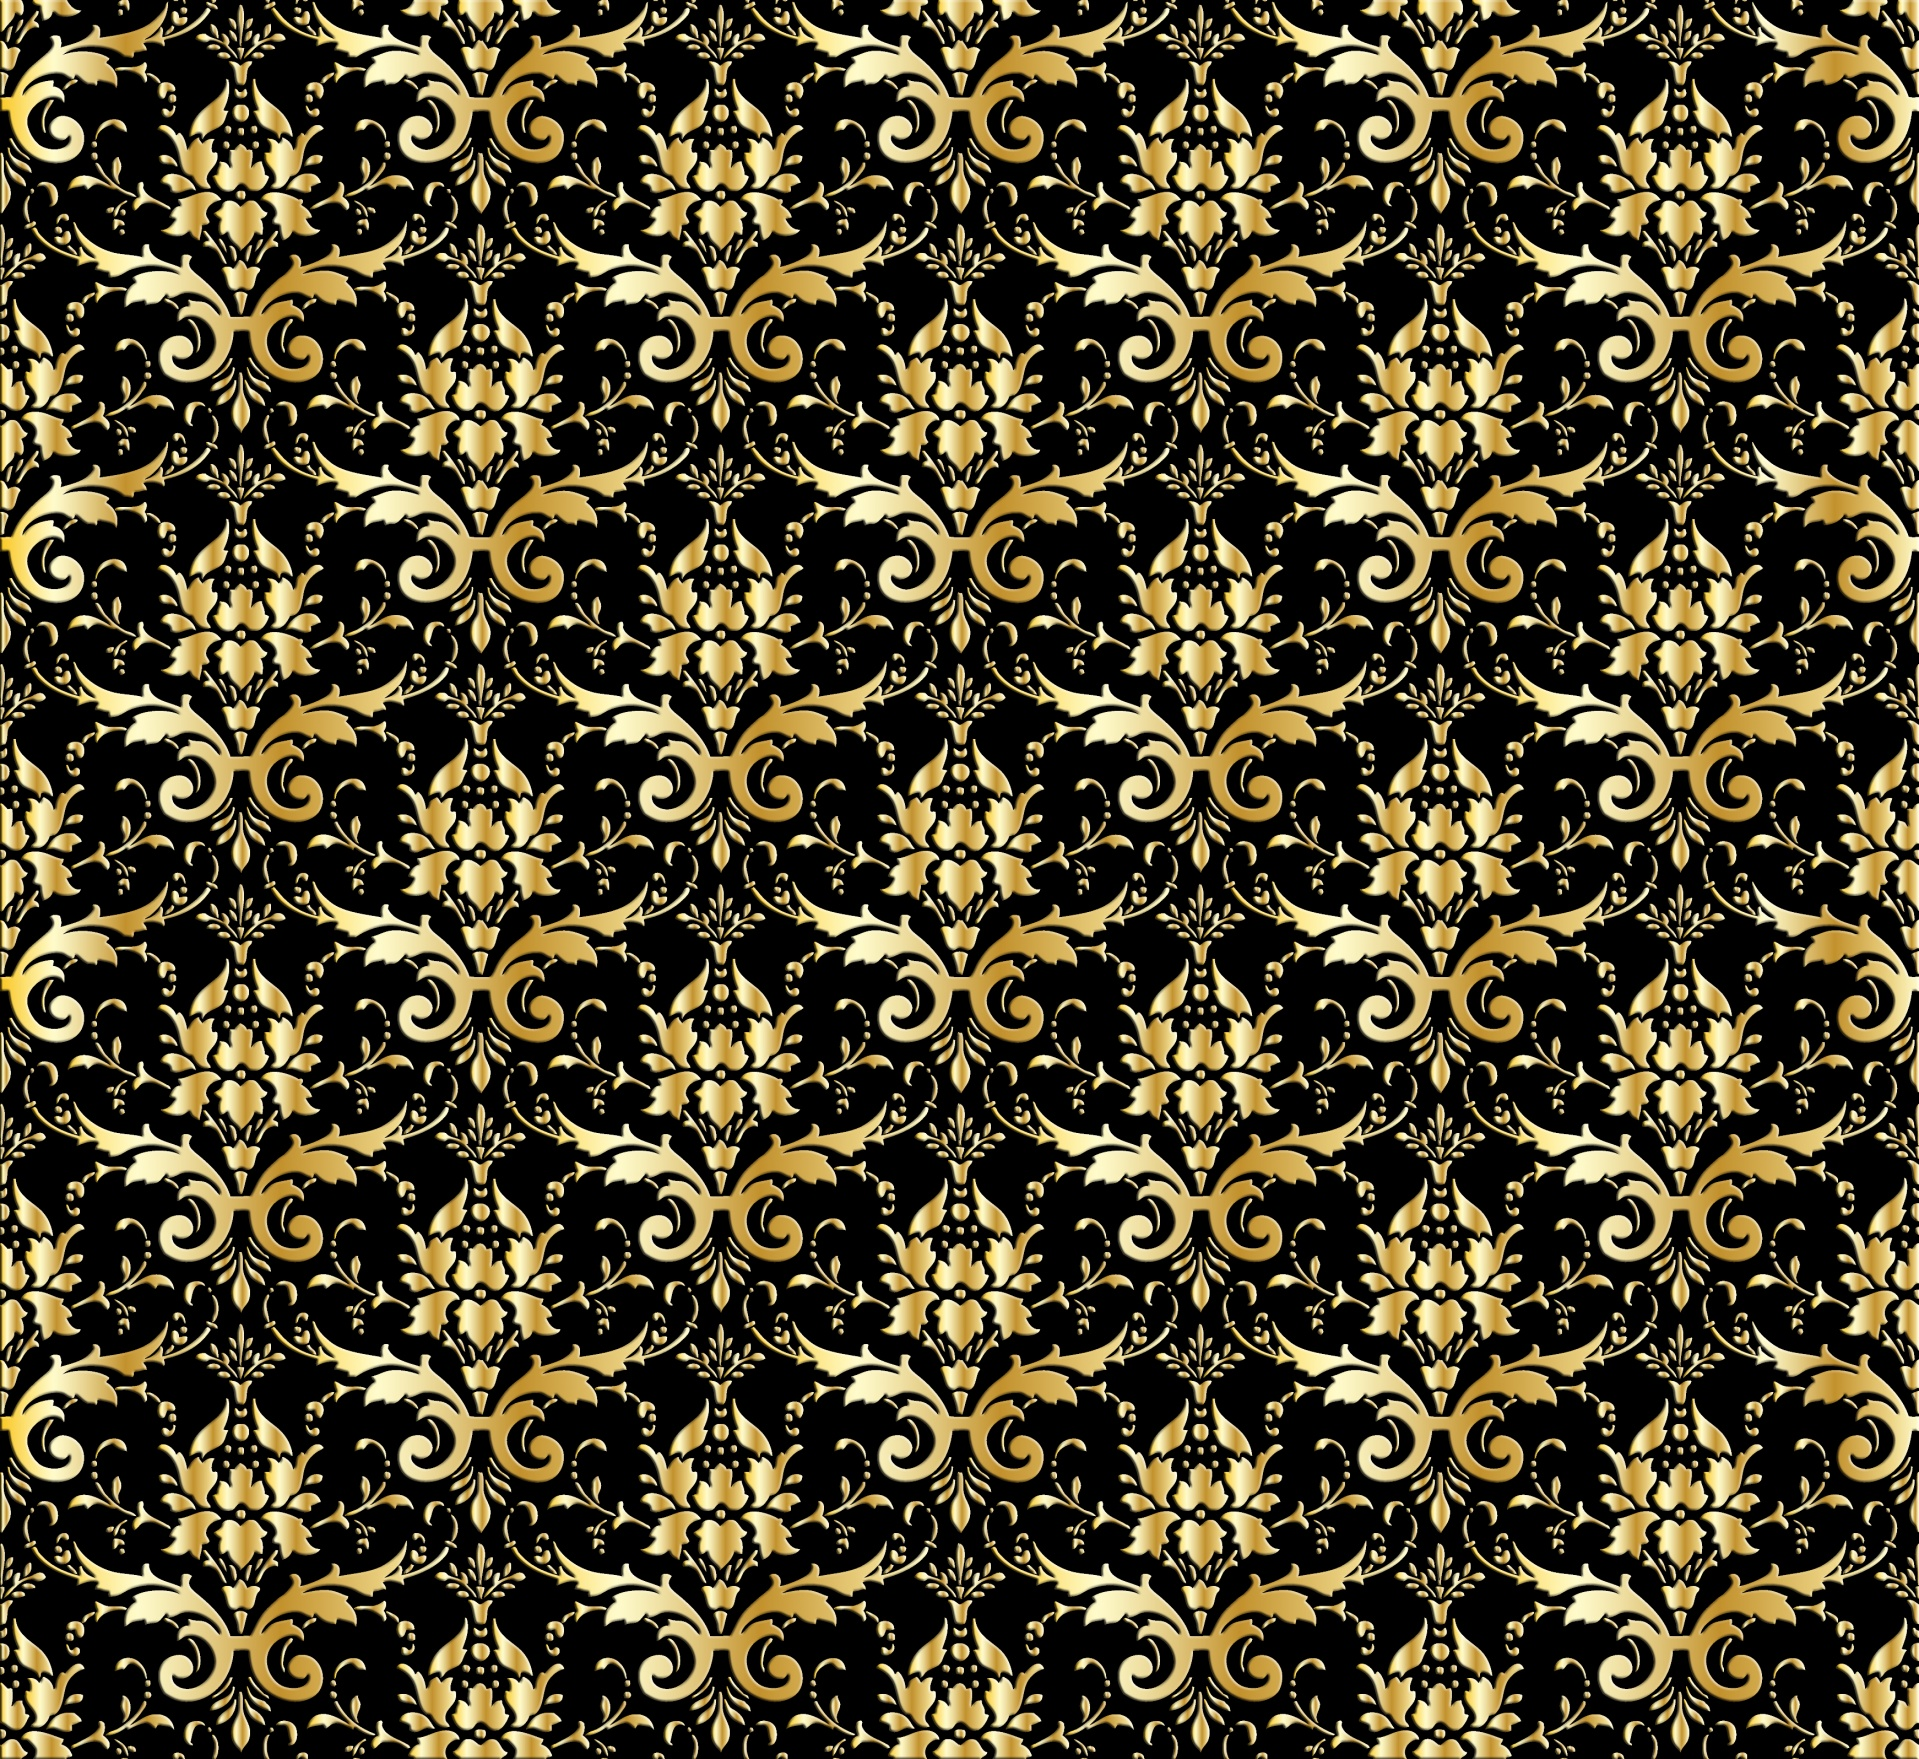 Vintage Black Wallpaper Damask Wallpaper Background Gold Free Stock Photo Public